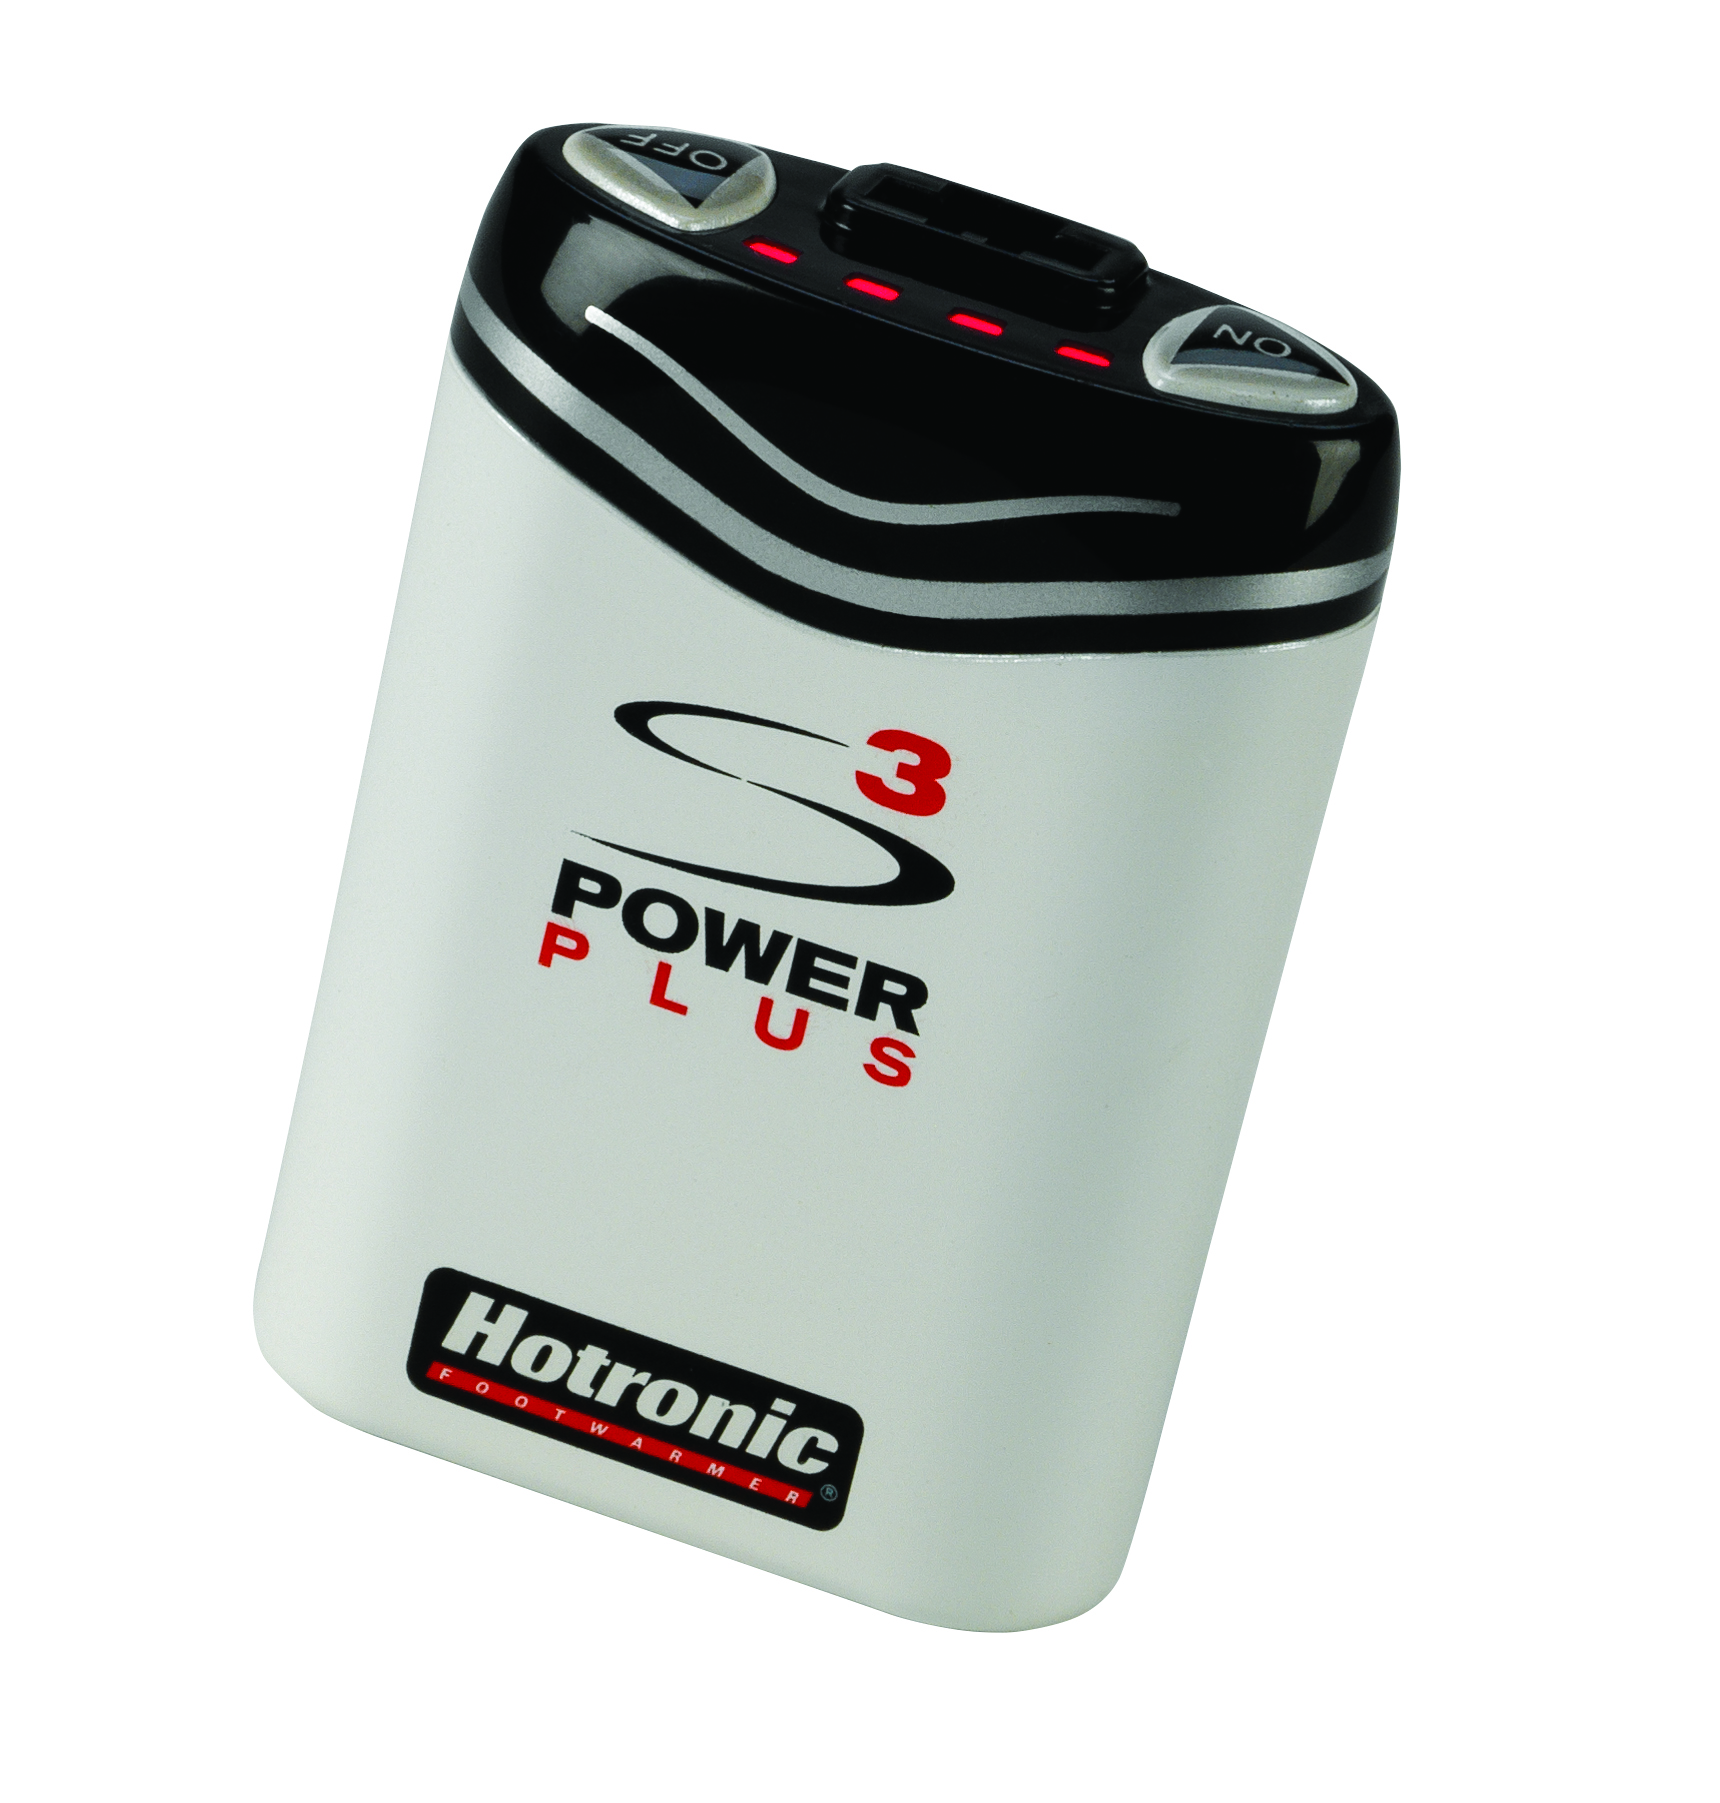 Hotronic FootWarmer Power Plus S4 - Power Set - Hotronic ...